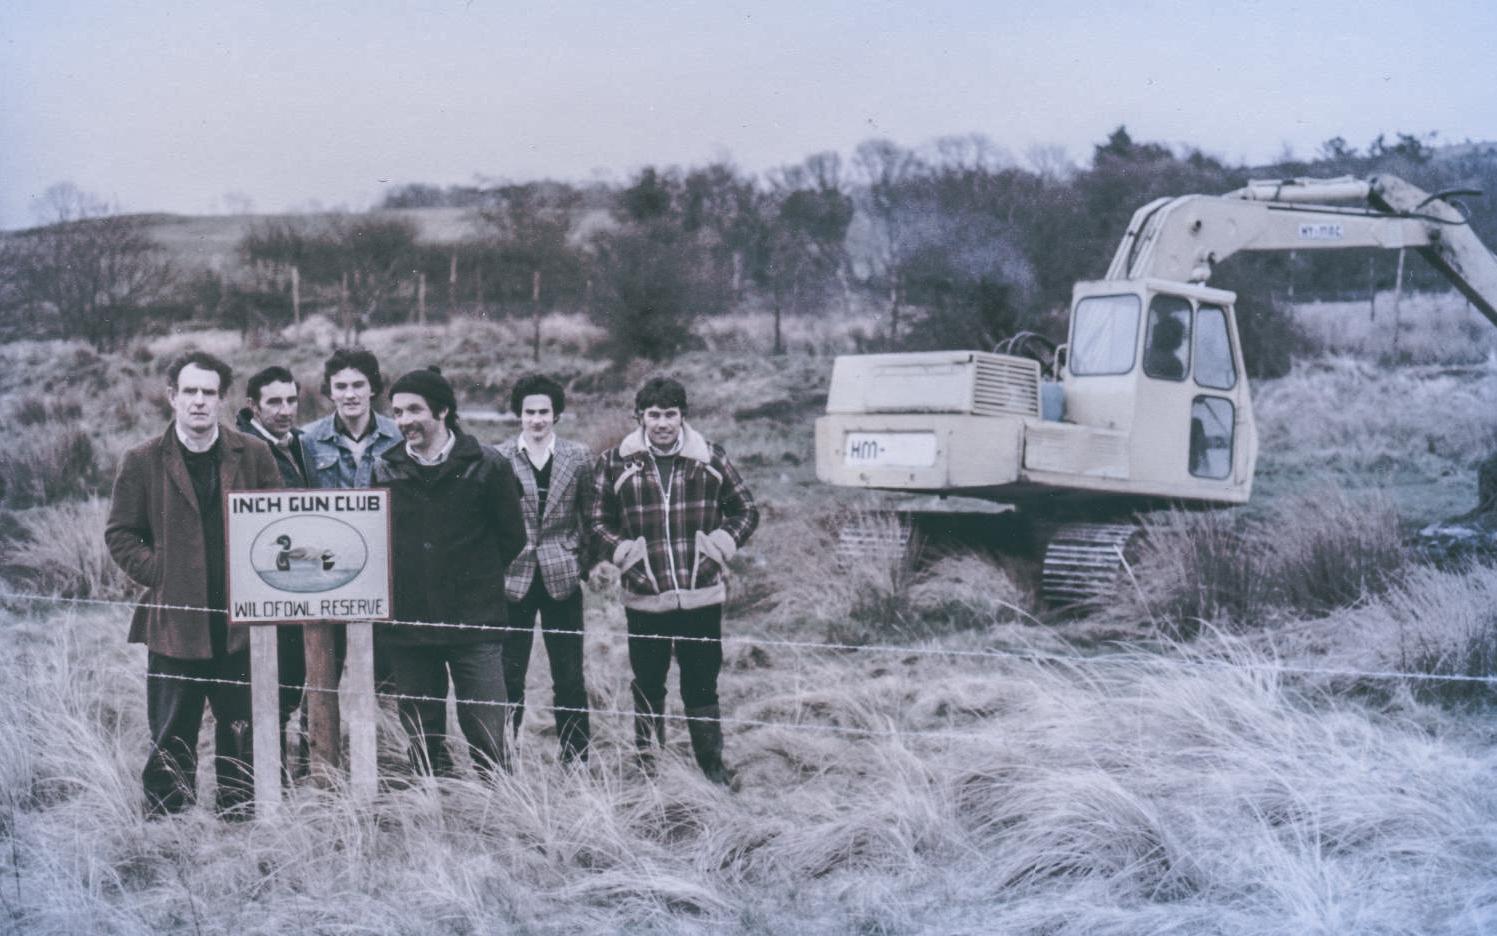 Stahack Farm wildfowl reserve 1970's.jpg